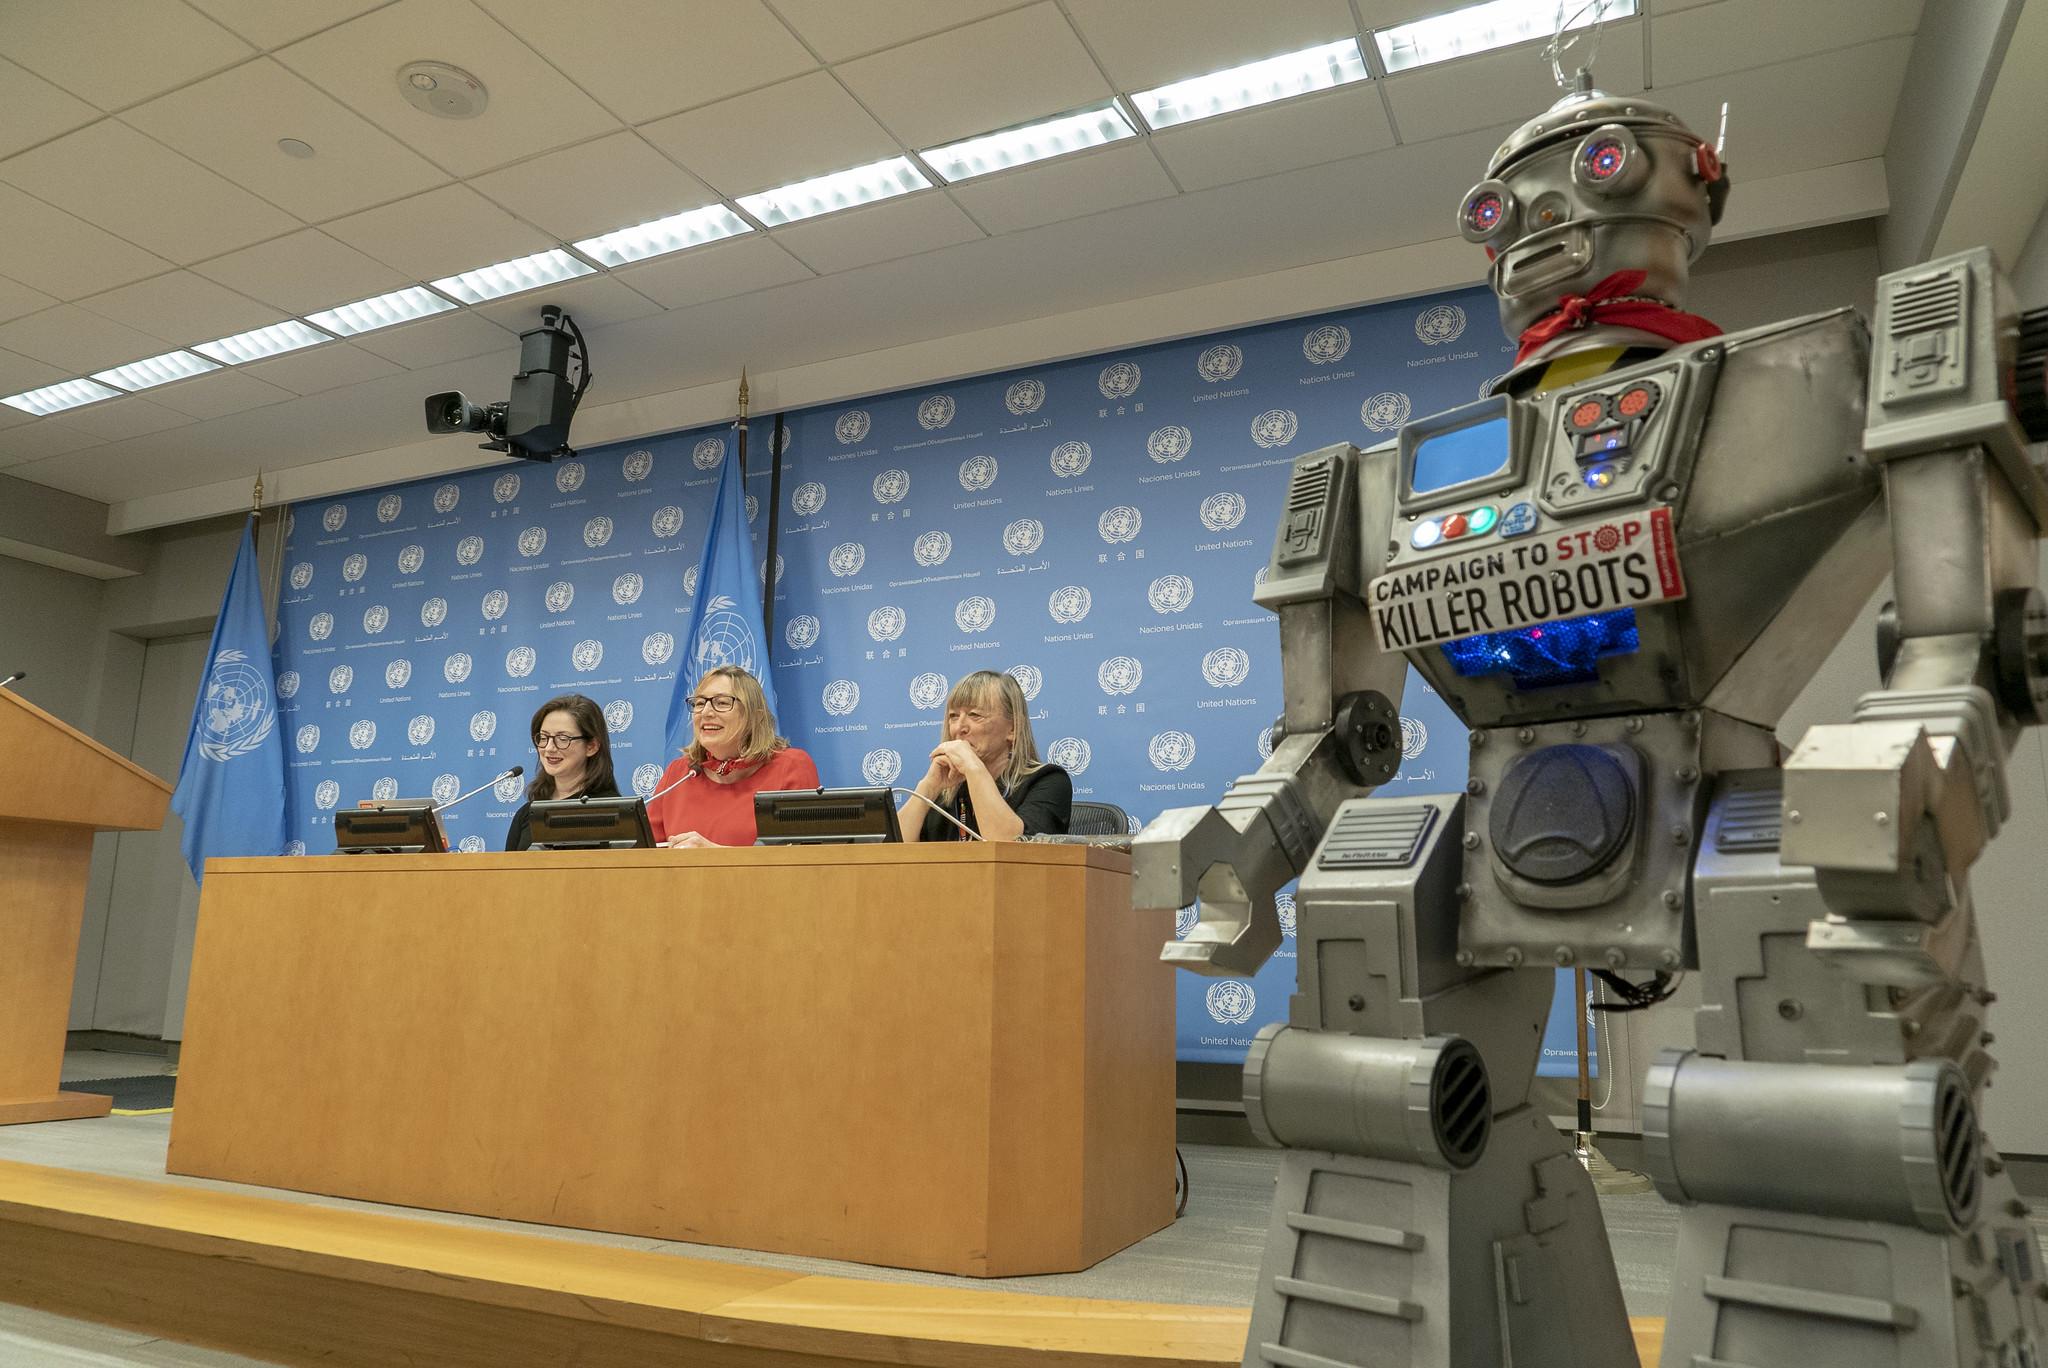 High-level concerns on killer robots at UN